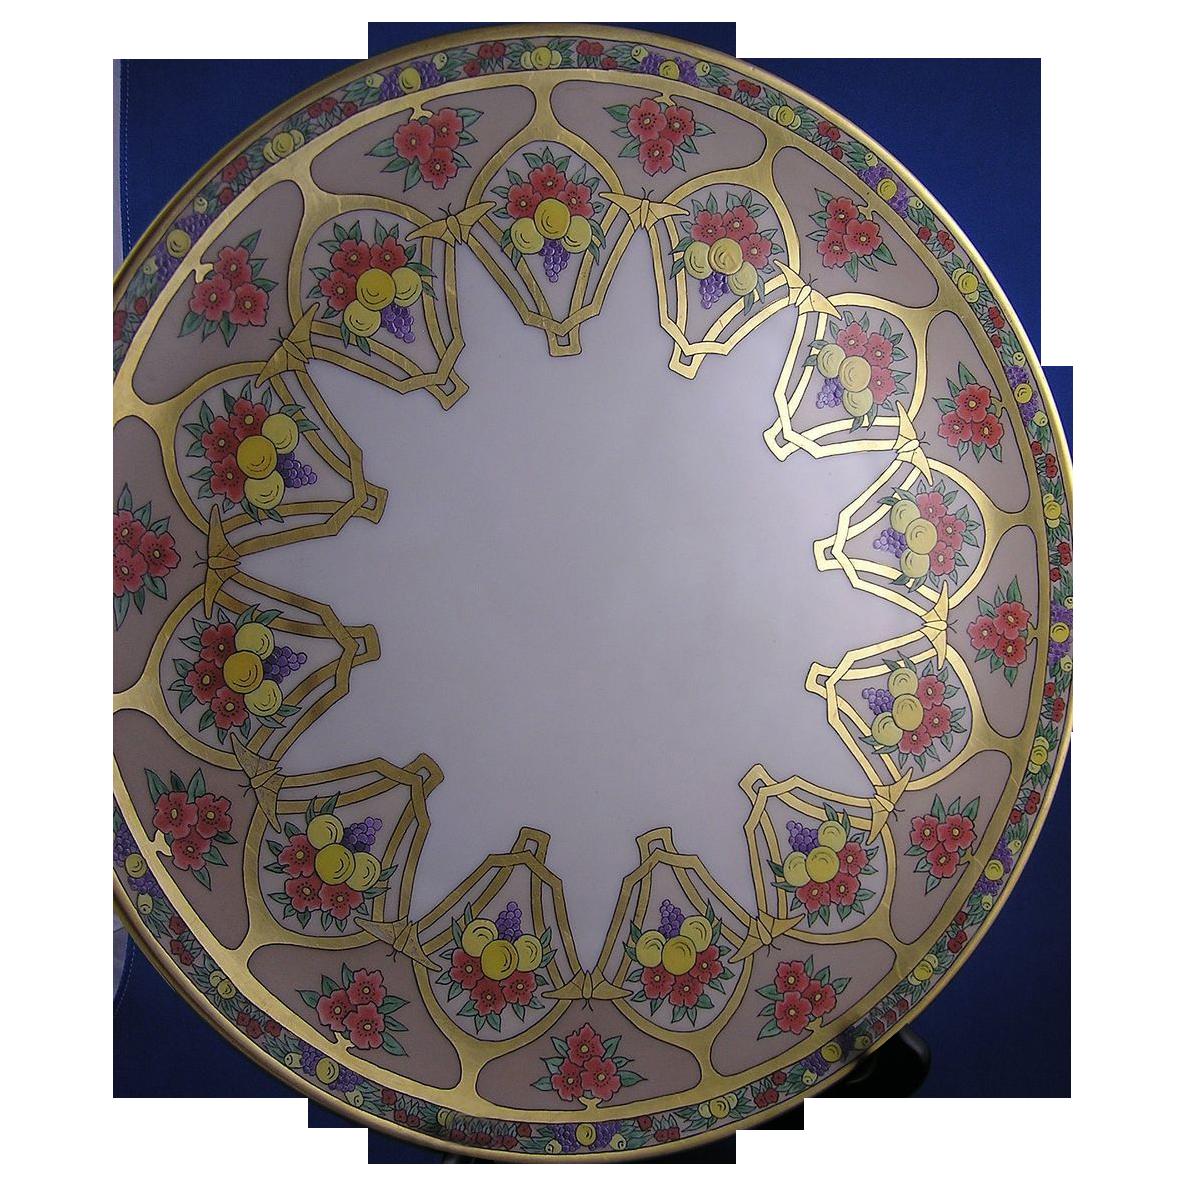 "Rosenthal Selb Bavaria Arts & Crafts Fruit & Floral Atlan Club Design Charger (Signed ""Bessie M. Lindsey""/Dated 1917)"